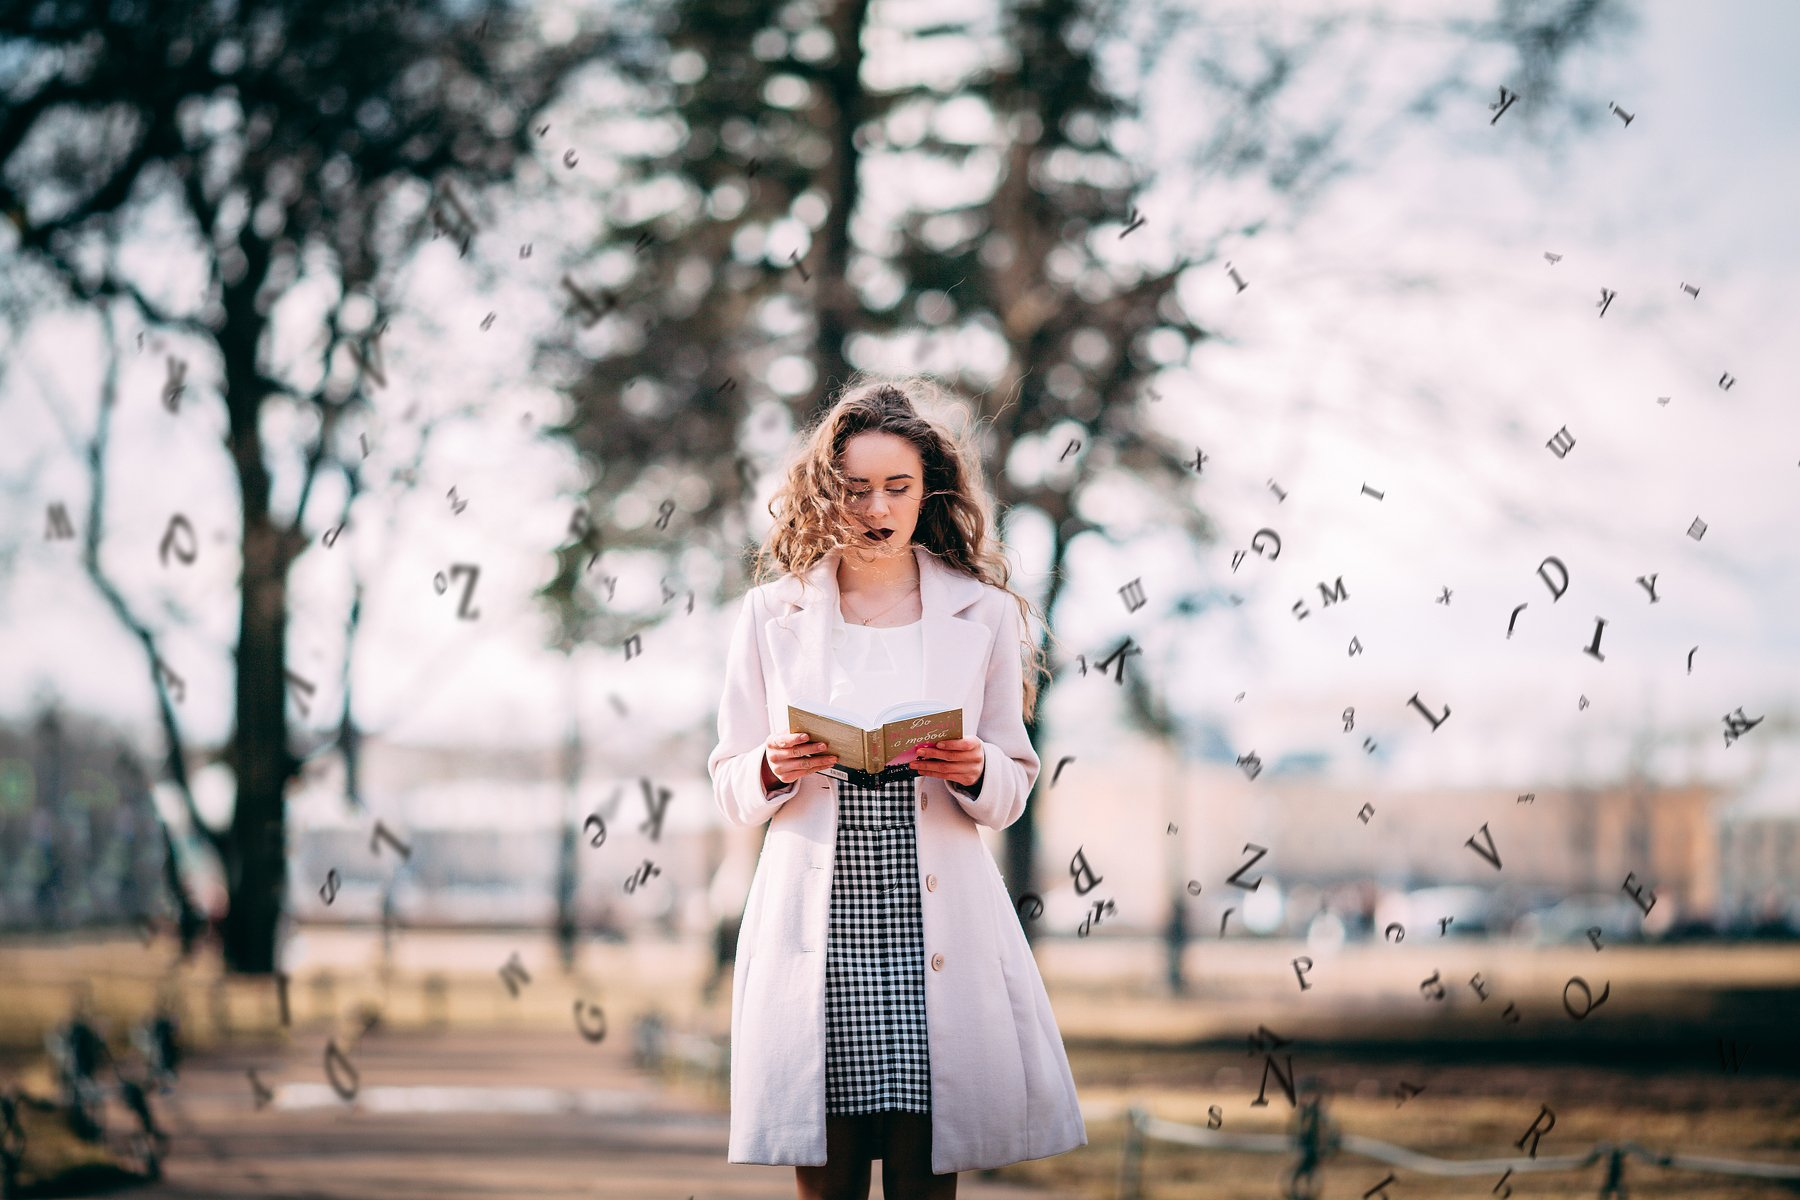 spring, portrait, спб, весна, портрет, city, sky, небо, город, архитектура, девушка, girl, Andrei Mikhailov